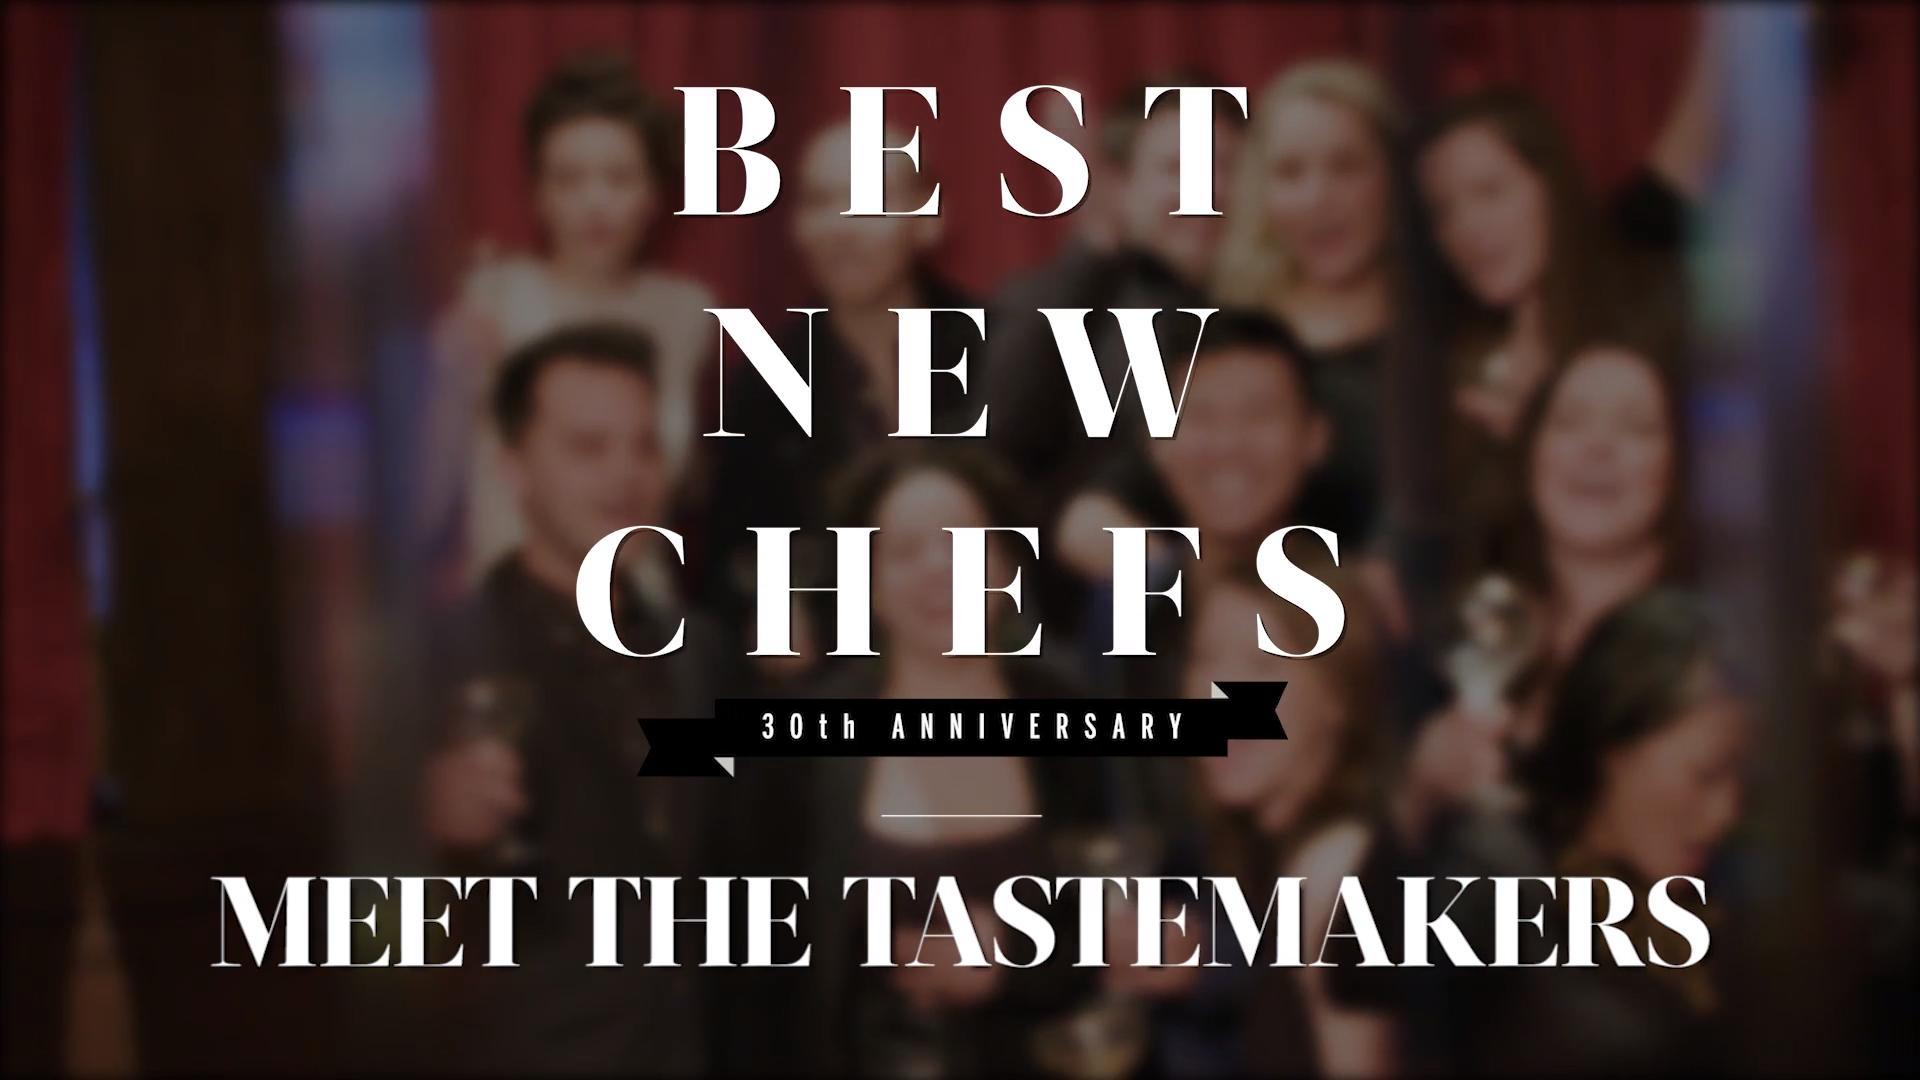 Food & Wine Best New Chefs 2018: Meet the New Class